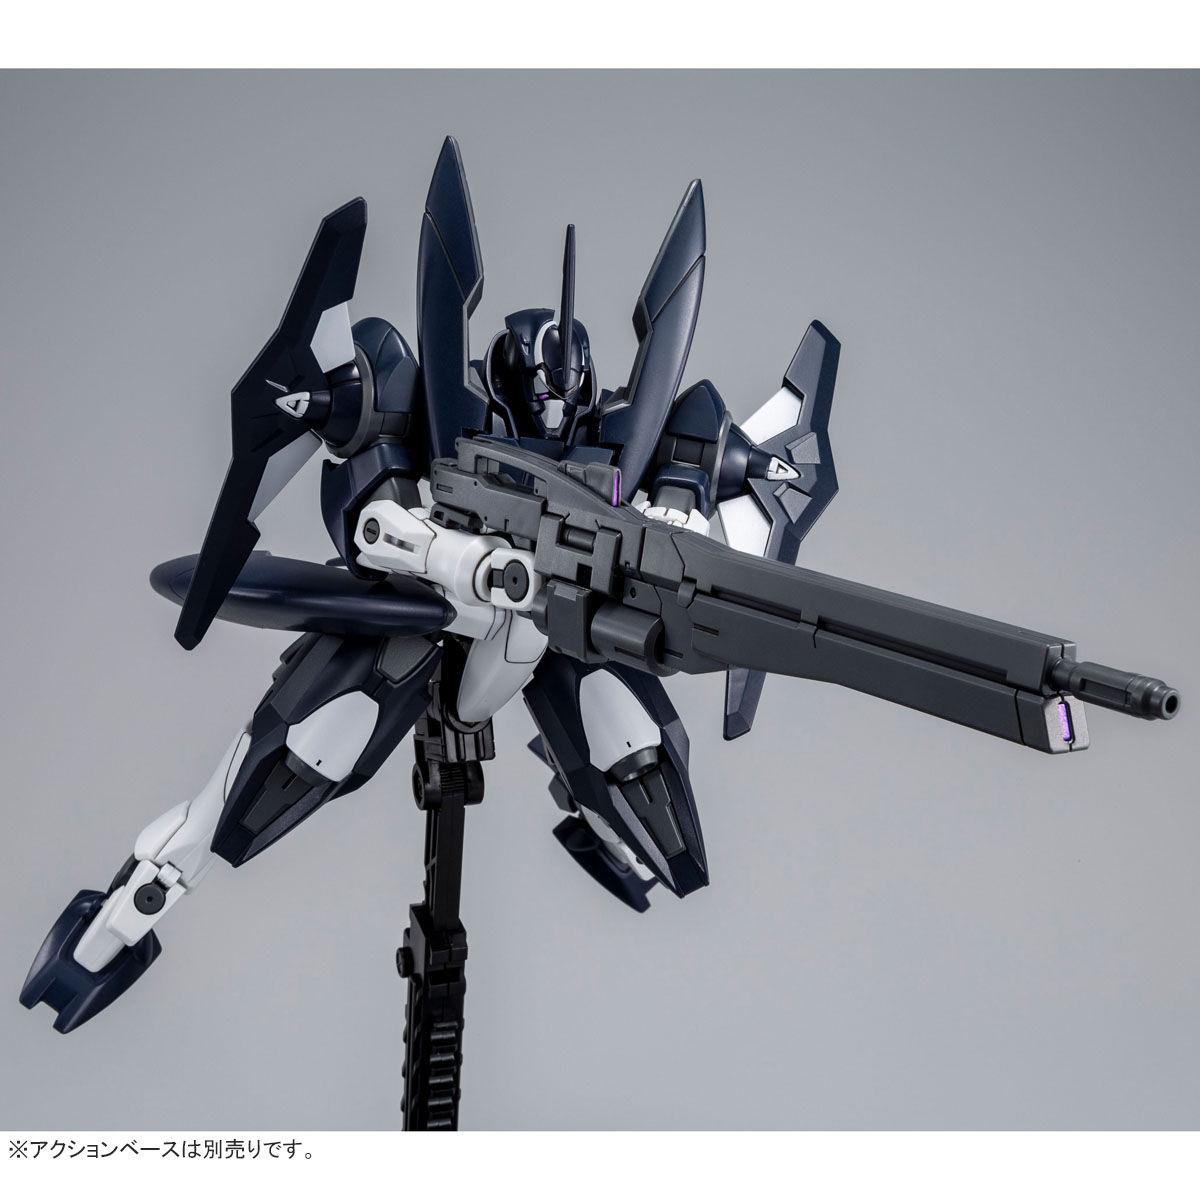 new release bandai gundam gunpla plastic model kit premium limited 1/144 HG GNX-604T ADVANCED GN-X 00 MSV